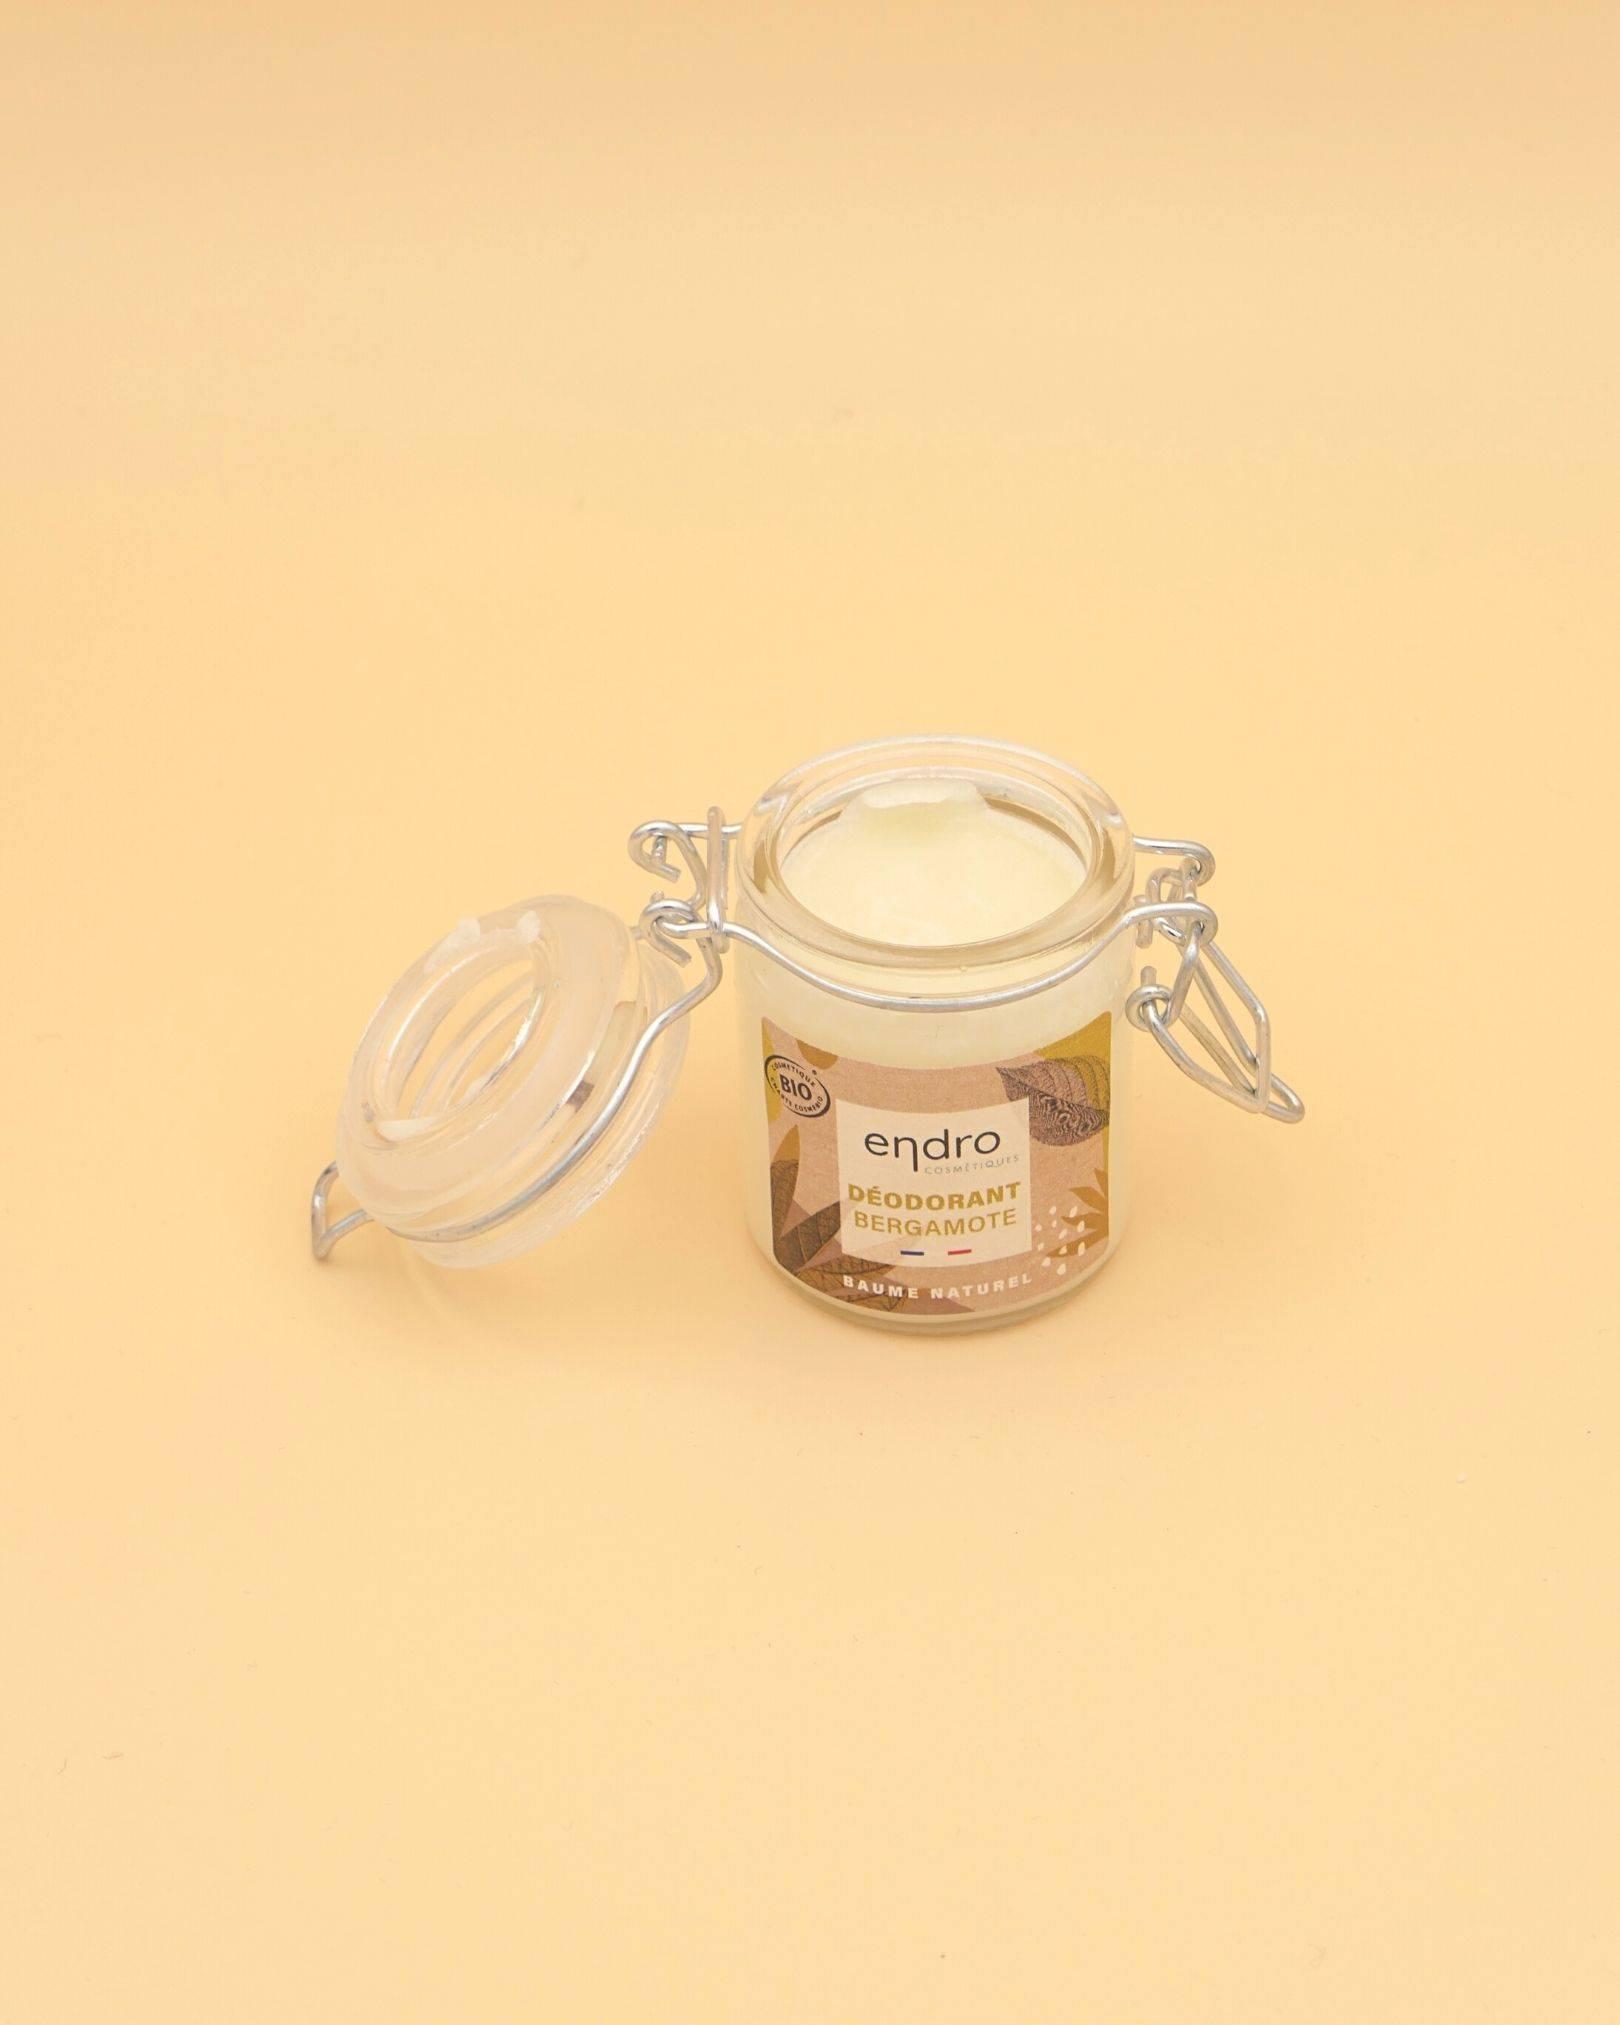 Le déodorant baume bergamote